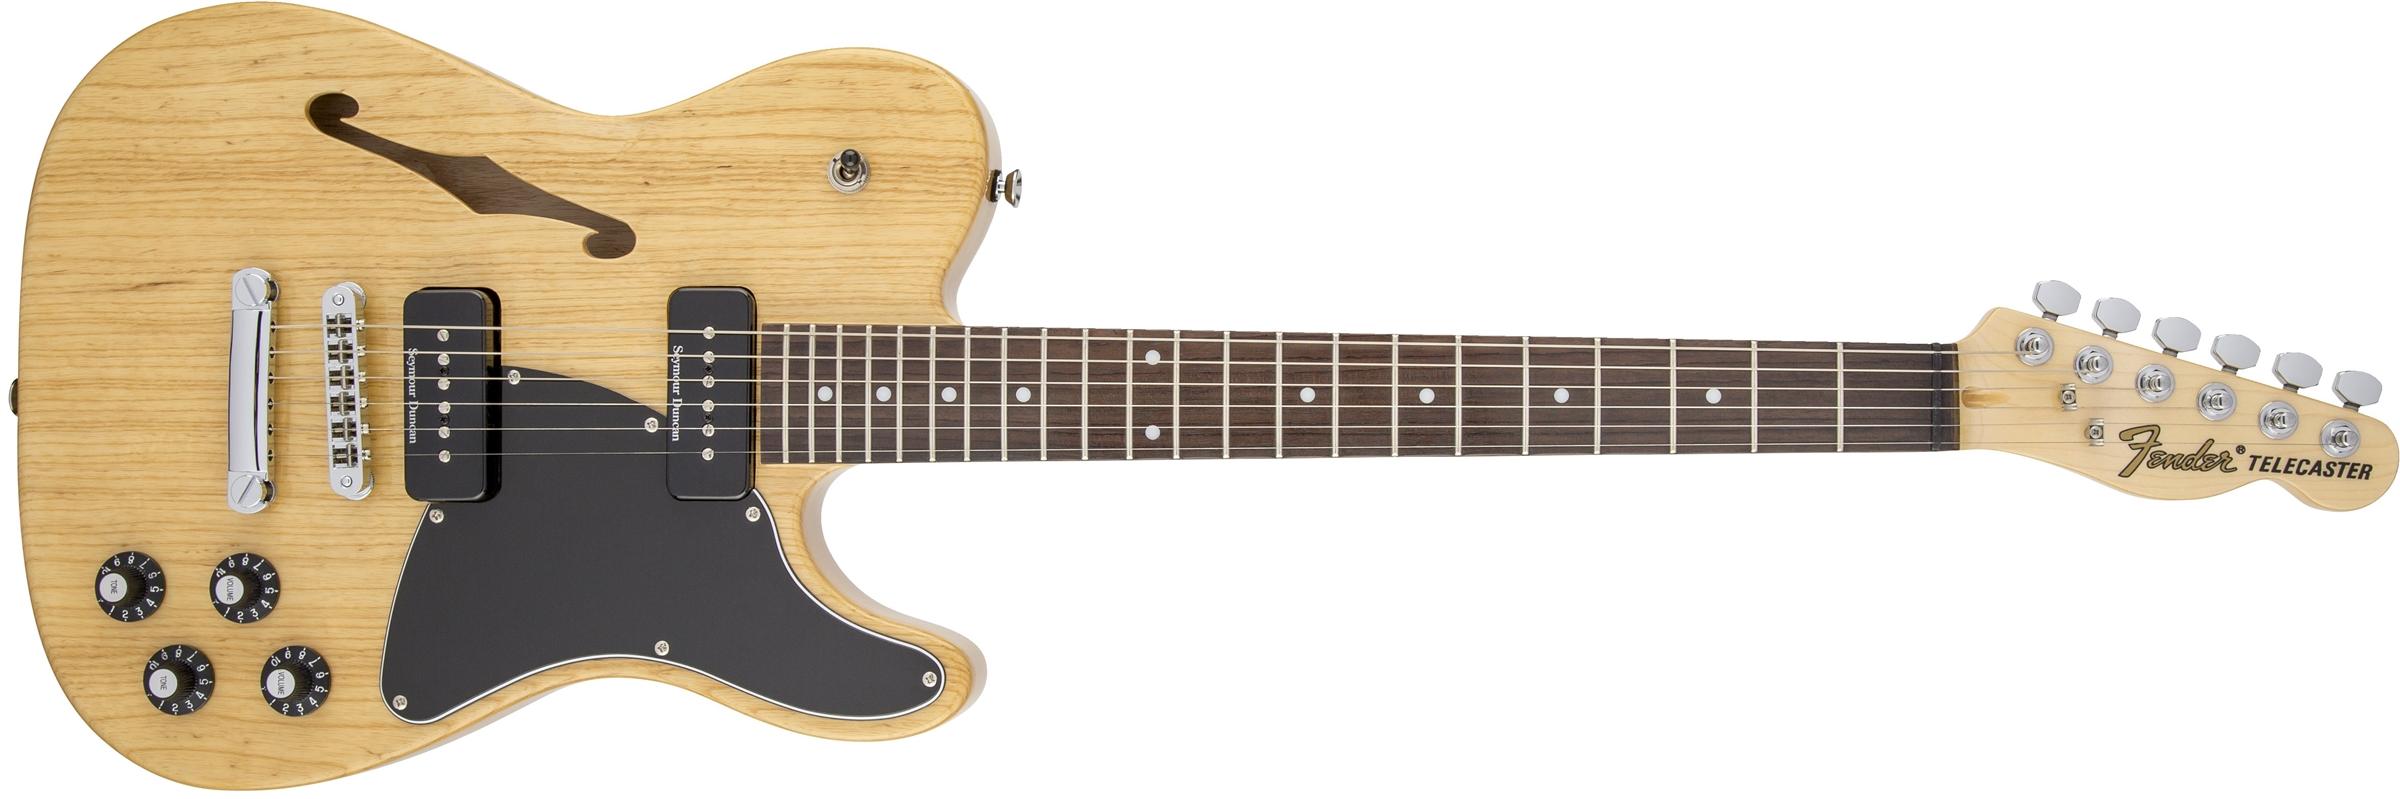 Jim Adkins Ja 90 Telecaster 174 Thinline Fender Electric